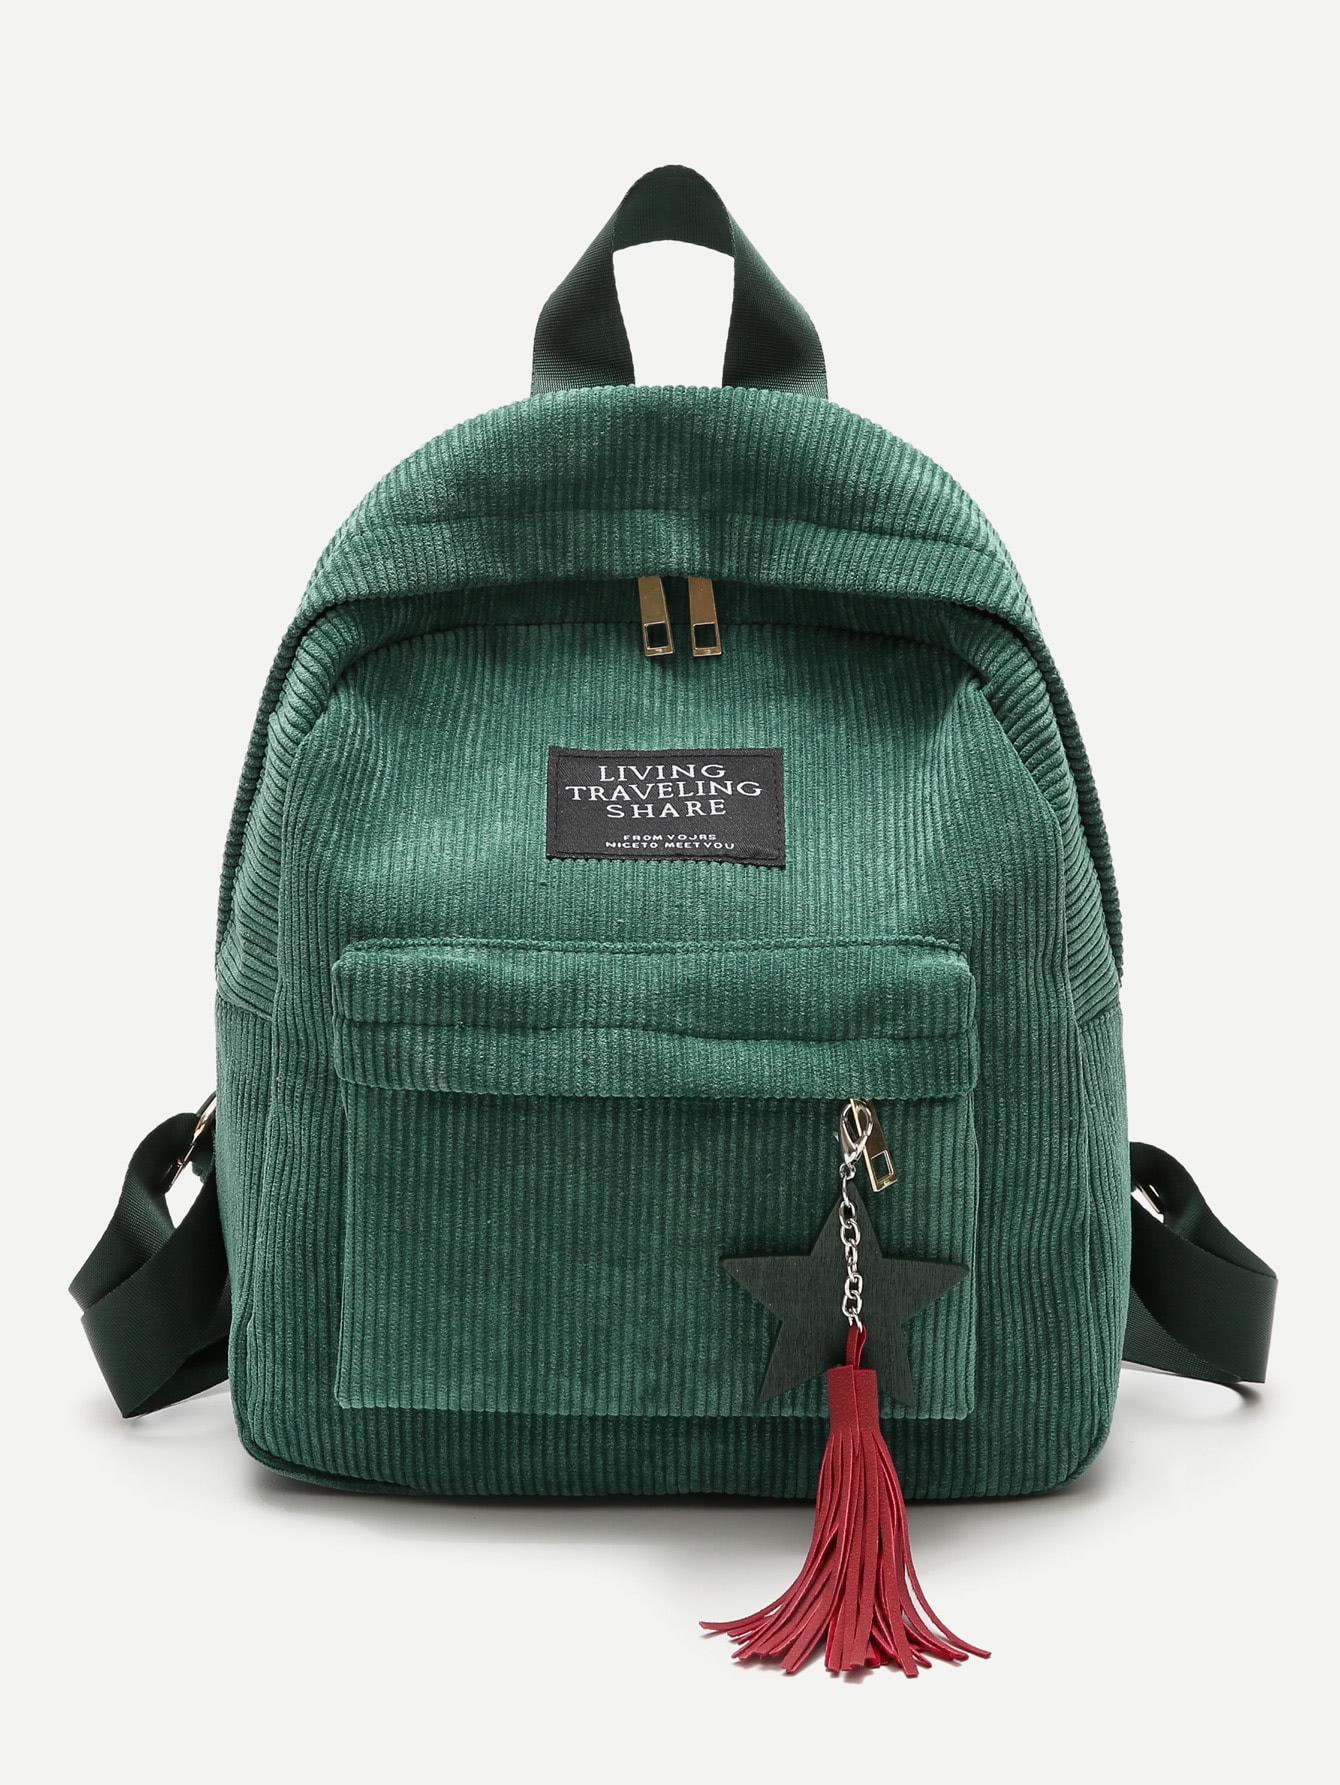 Tassel Decor Corduroy Backpack